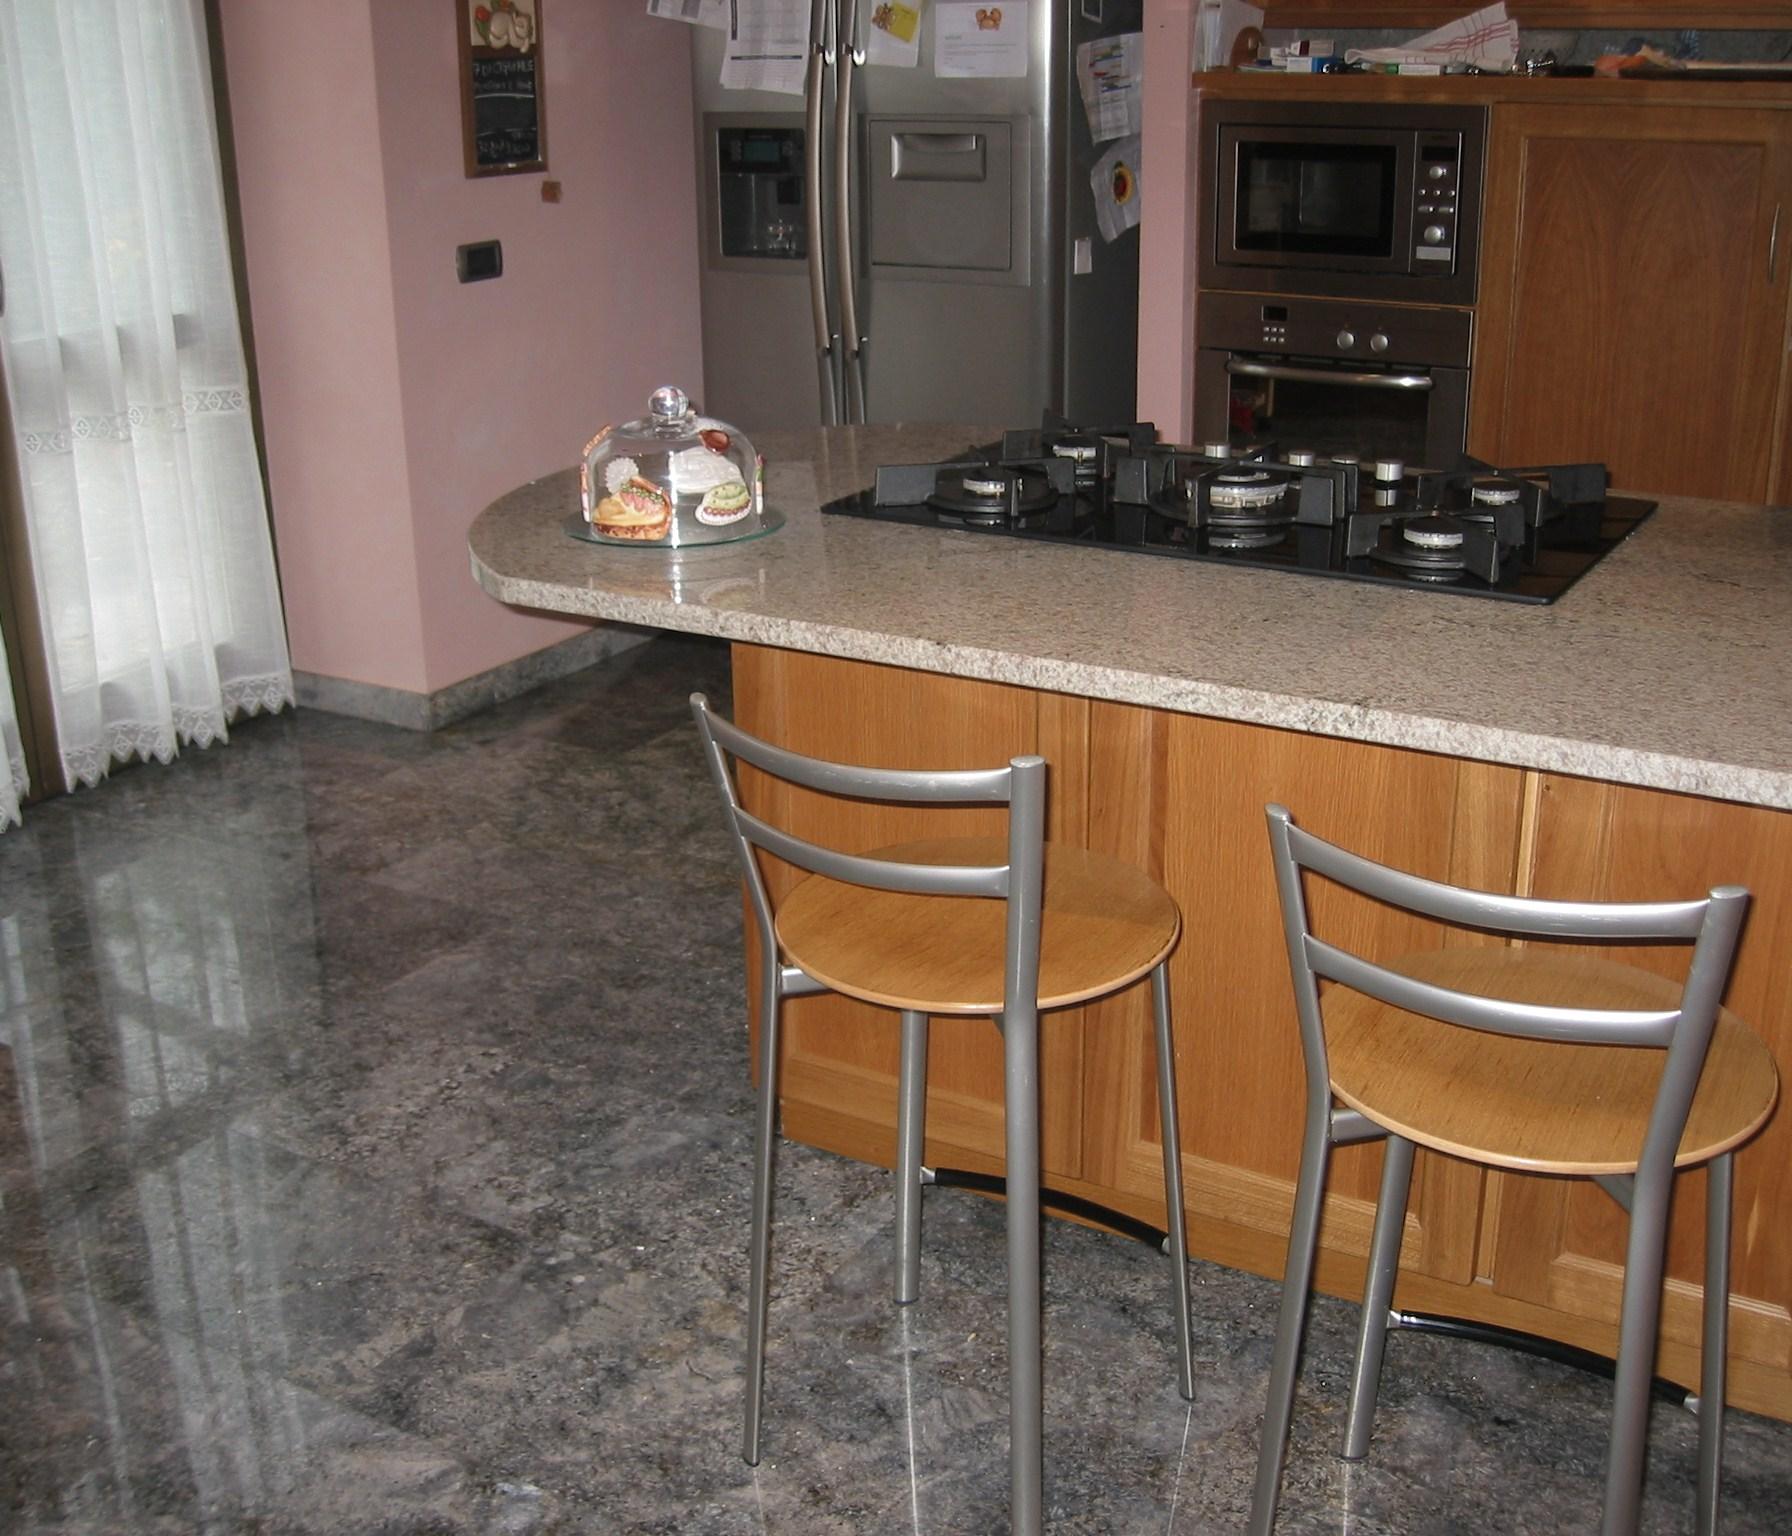 Top cucina ceramica top cucina granito - Top cucina in granito ...